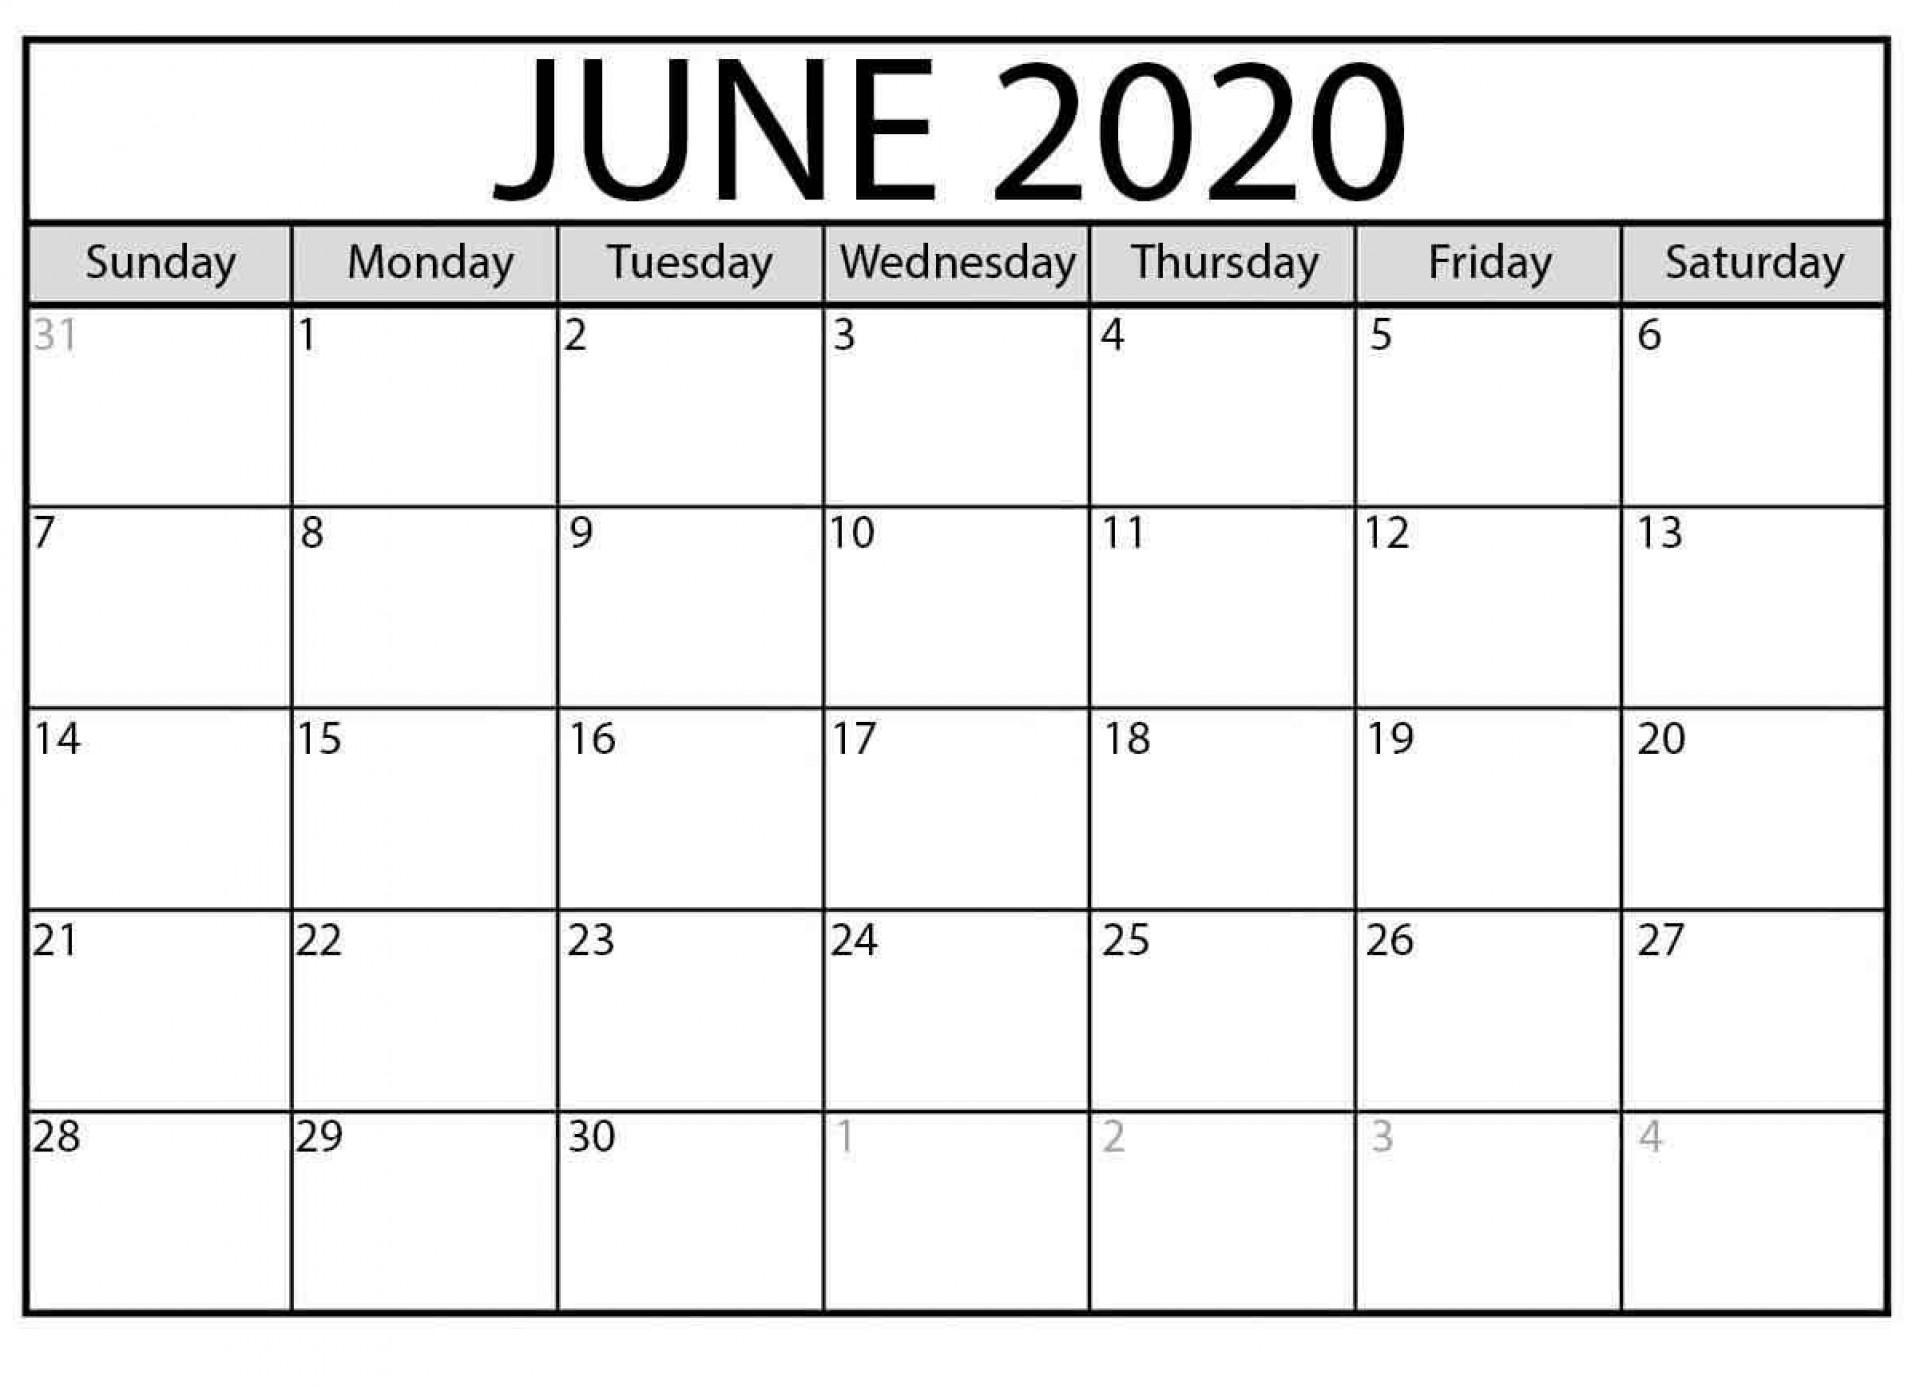 003 Unbelievable Printable Calendar Template June 2020 Highest Clarity  Free1920